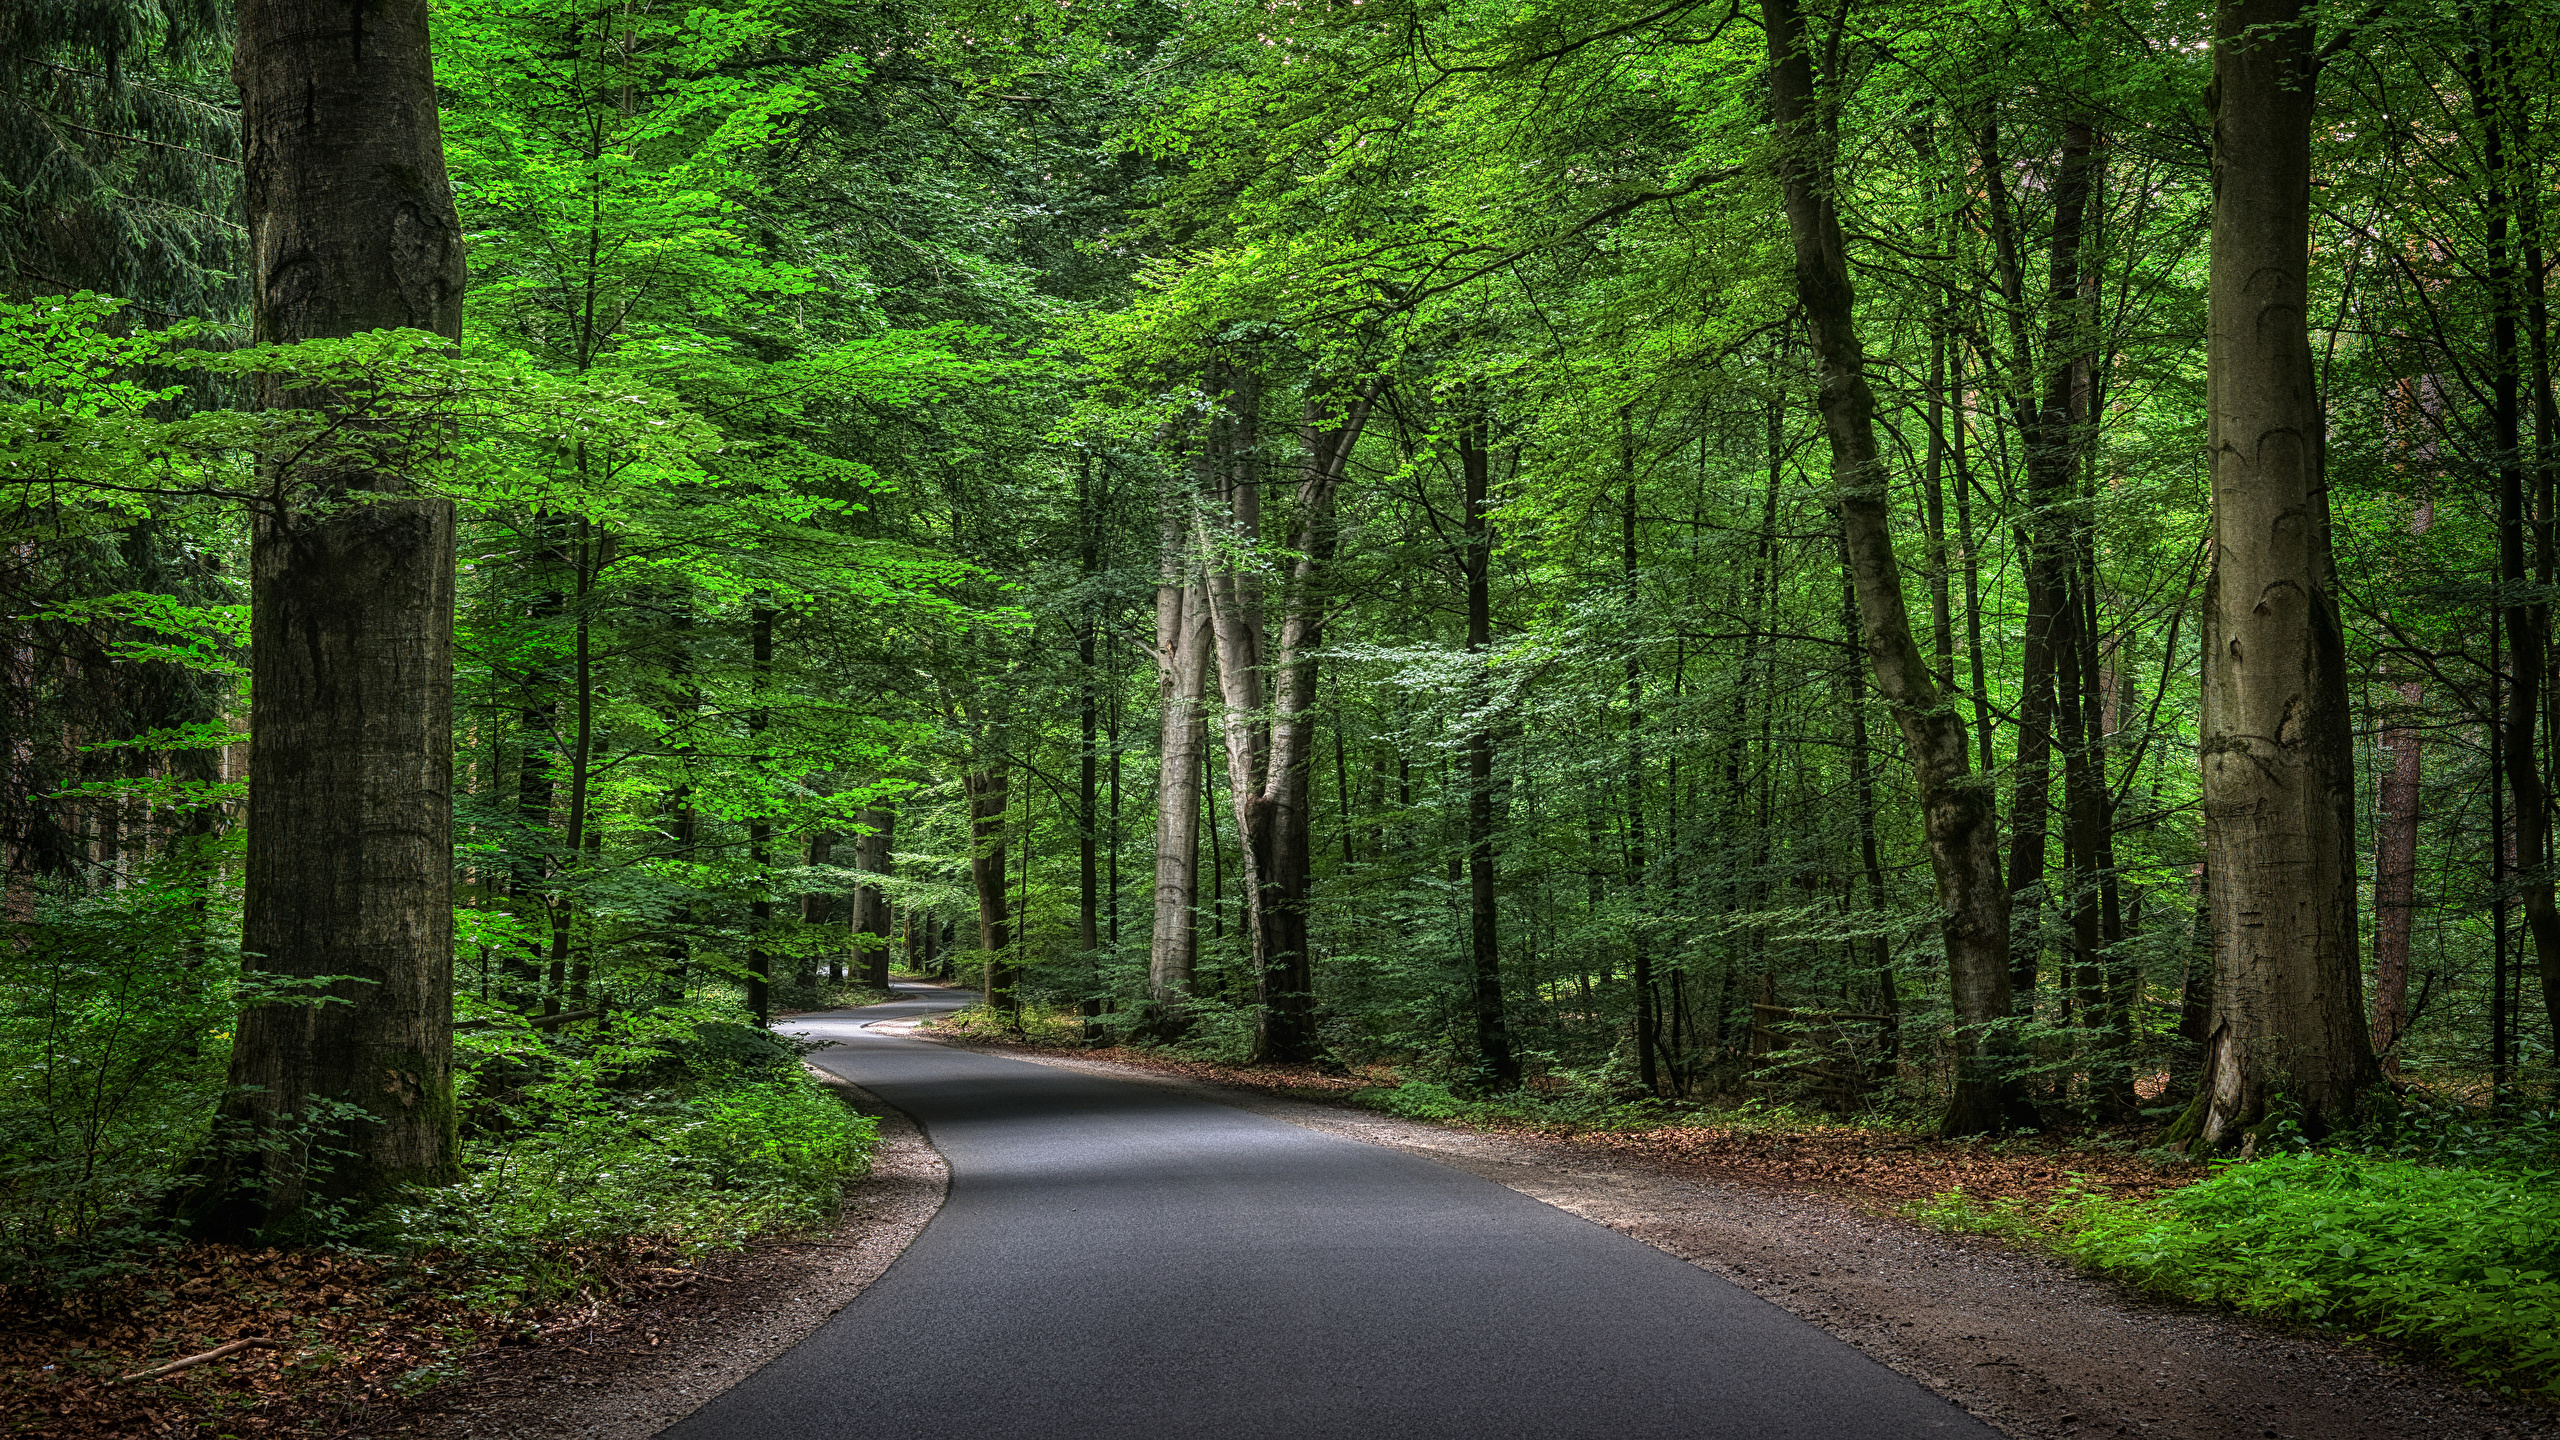 Картинки Германия Природа лес Дороги Деревья 2560x1440 Леса дерево дерева деревьев